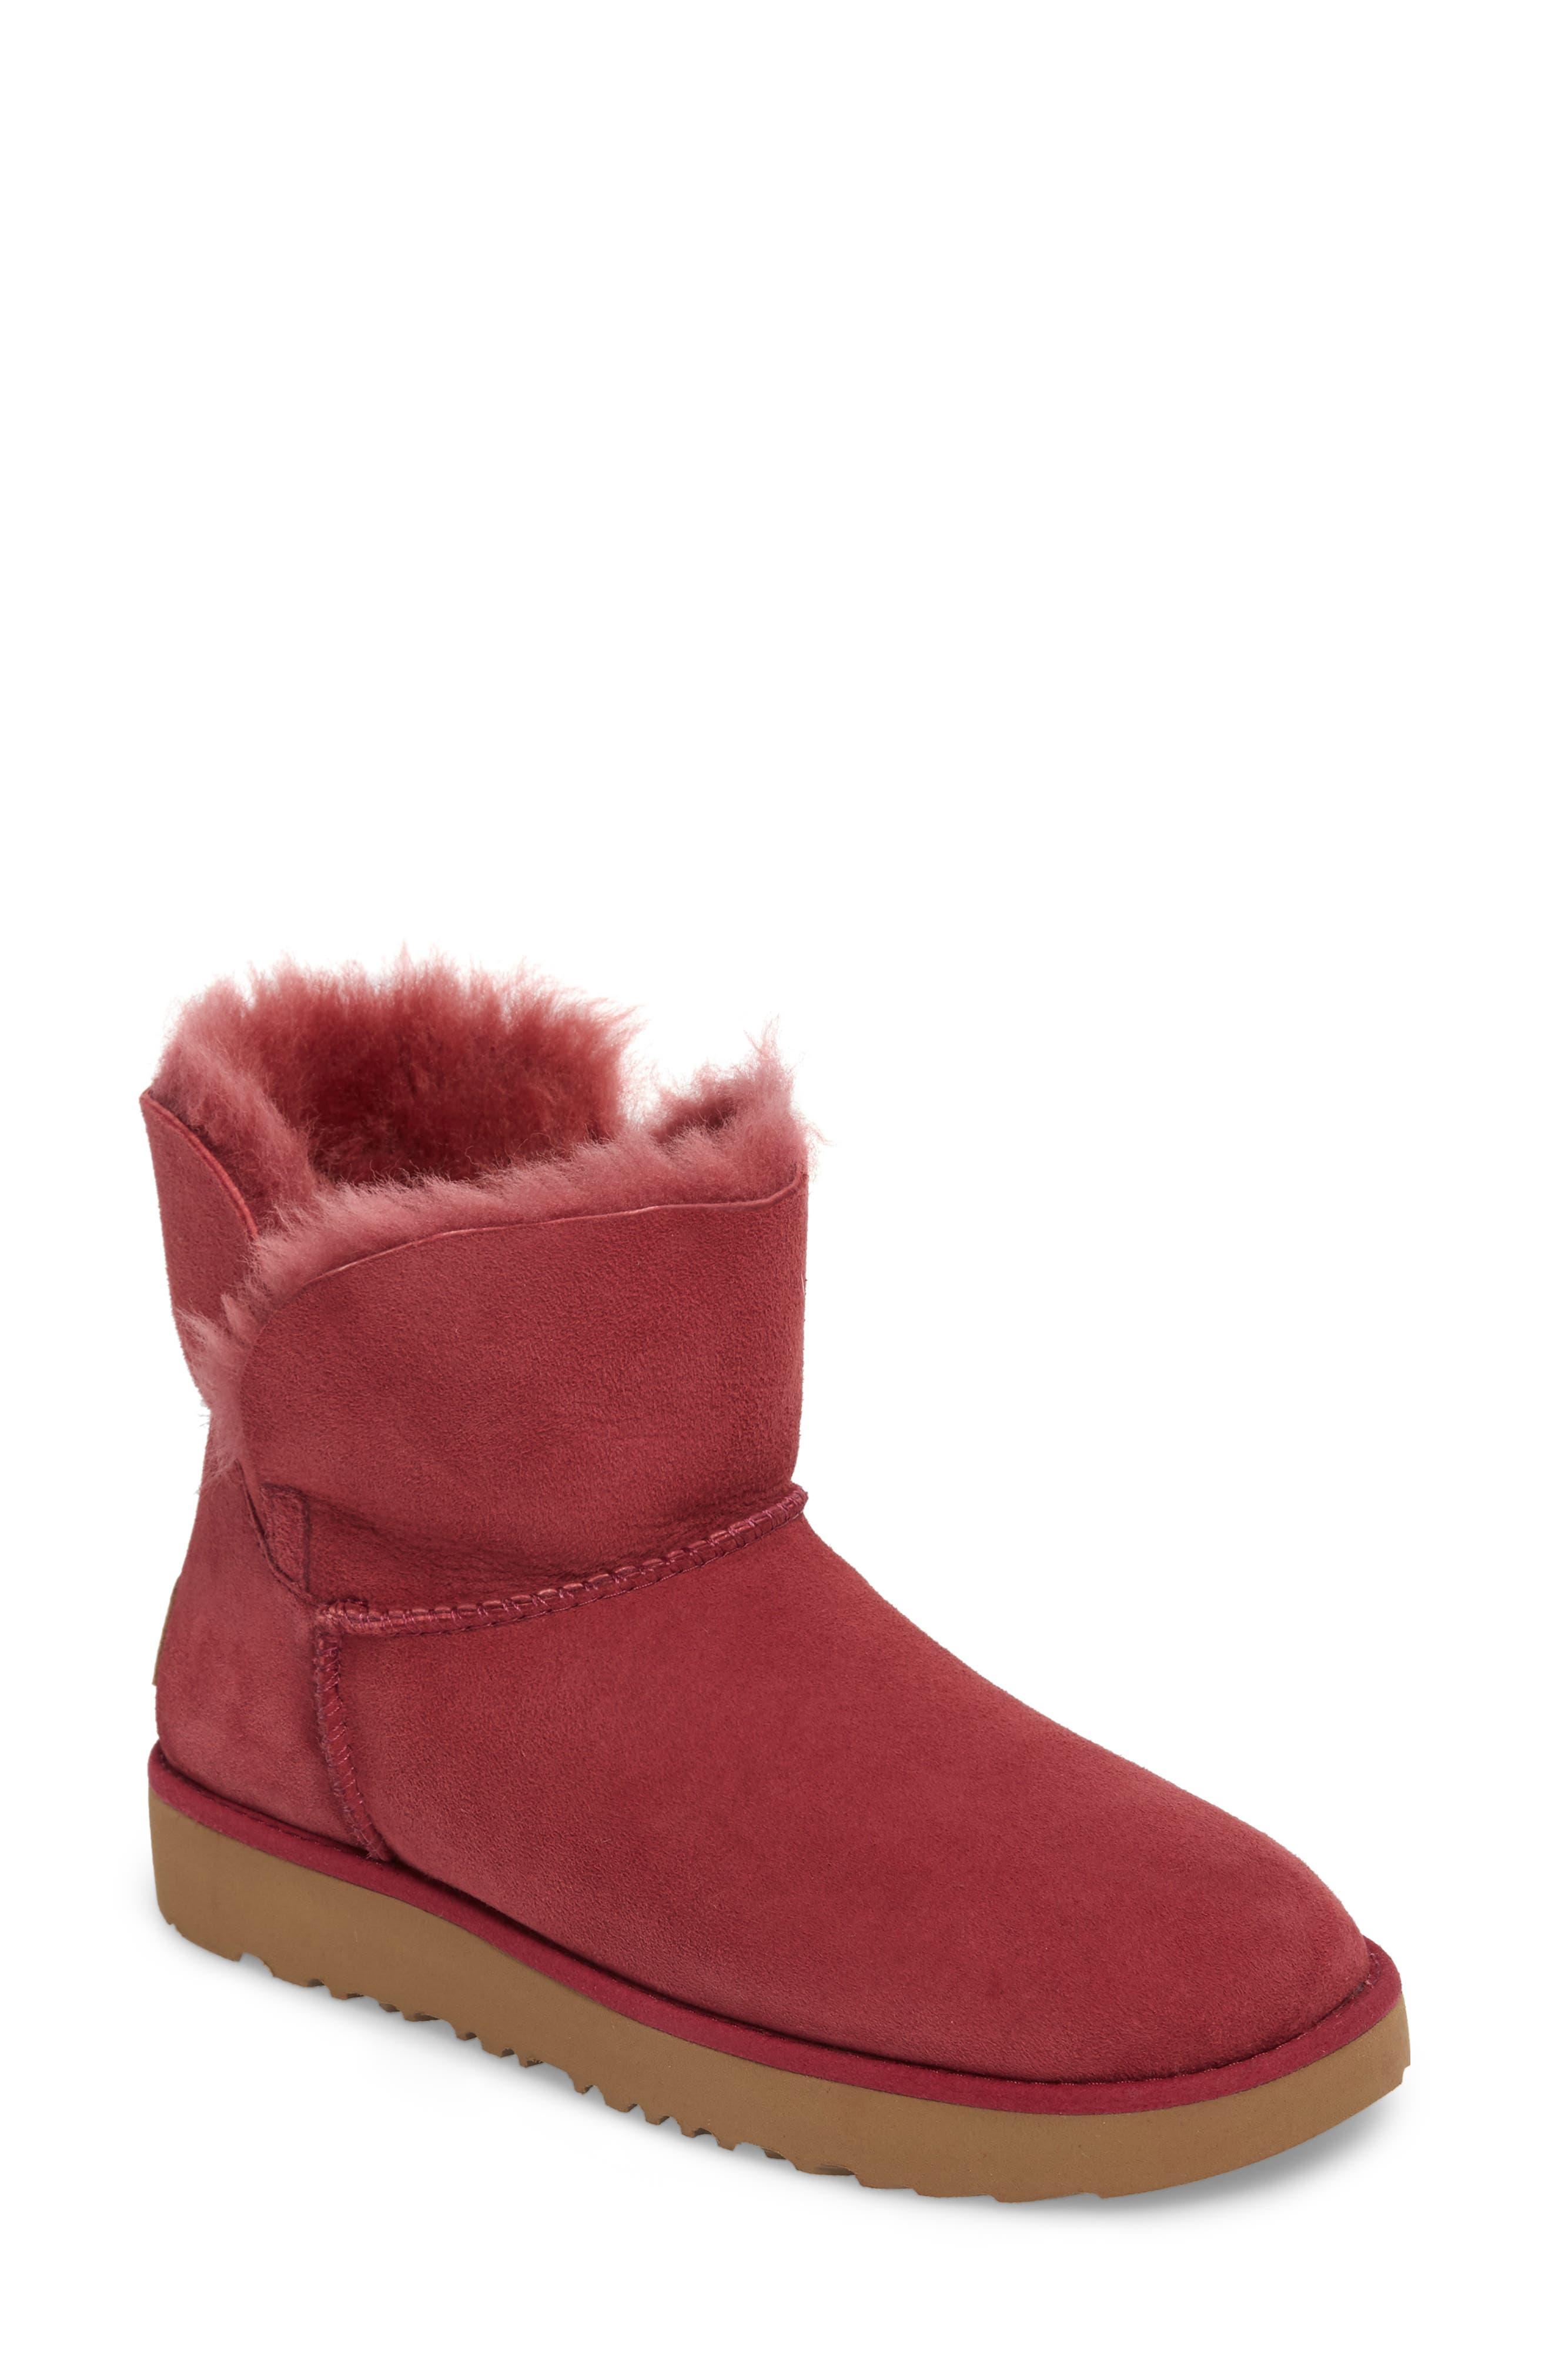 Classic Cuff Mini Boot,                             Main thumbnail 1, color,                             Garnet Suede